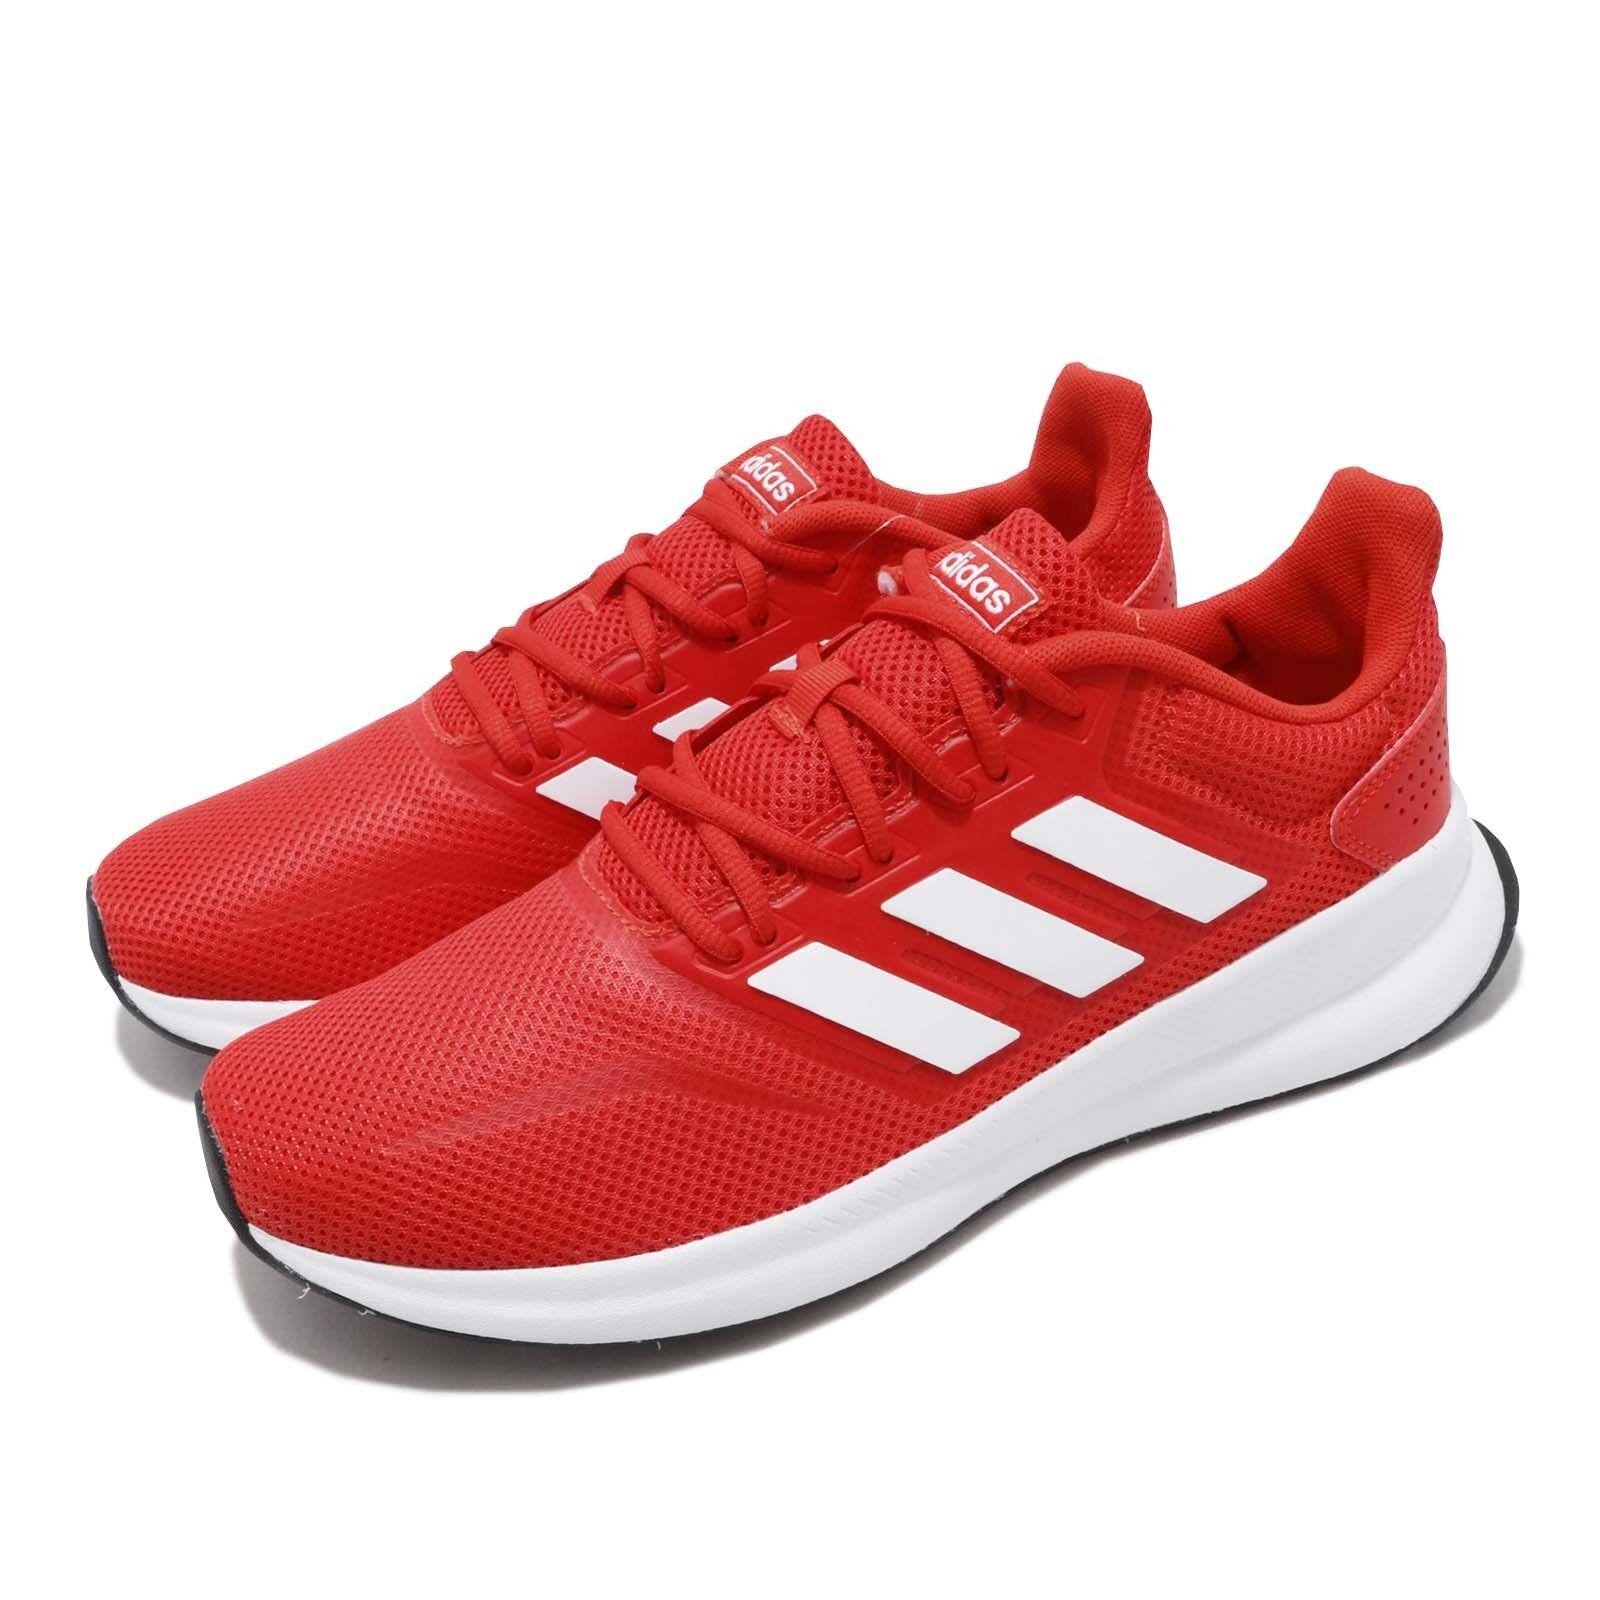 Adidas Runfalcon Active rosso bianca Men Running Training scarpe scarpe da ginnastica F36202